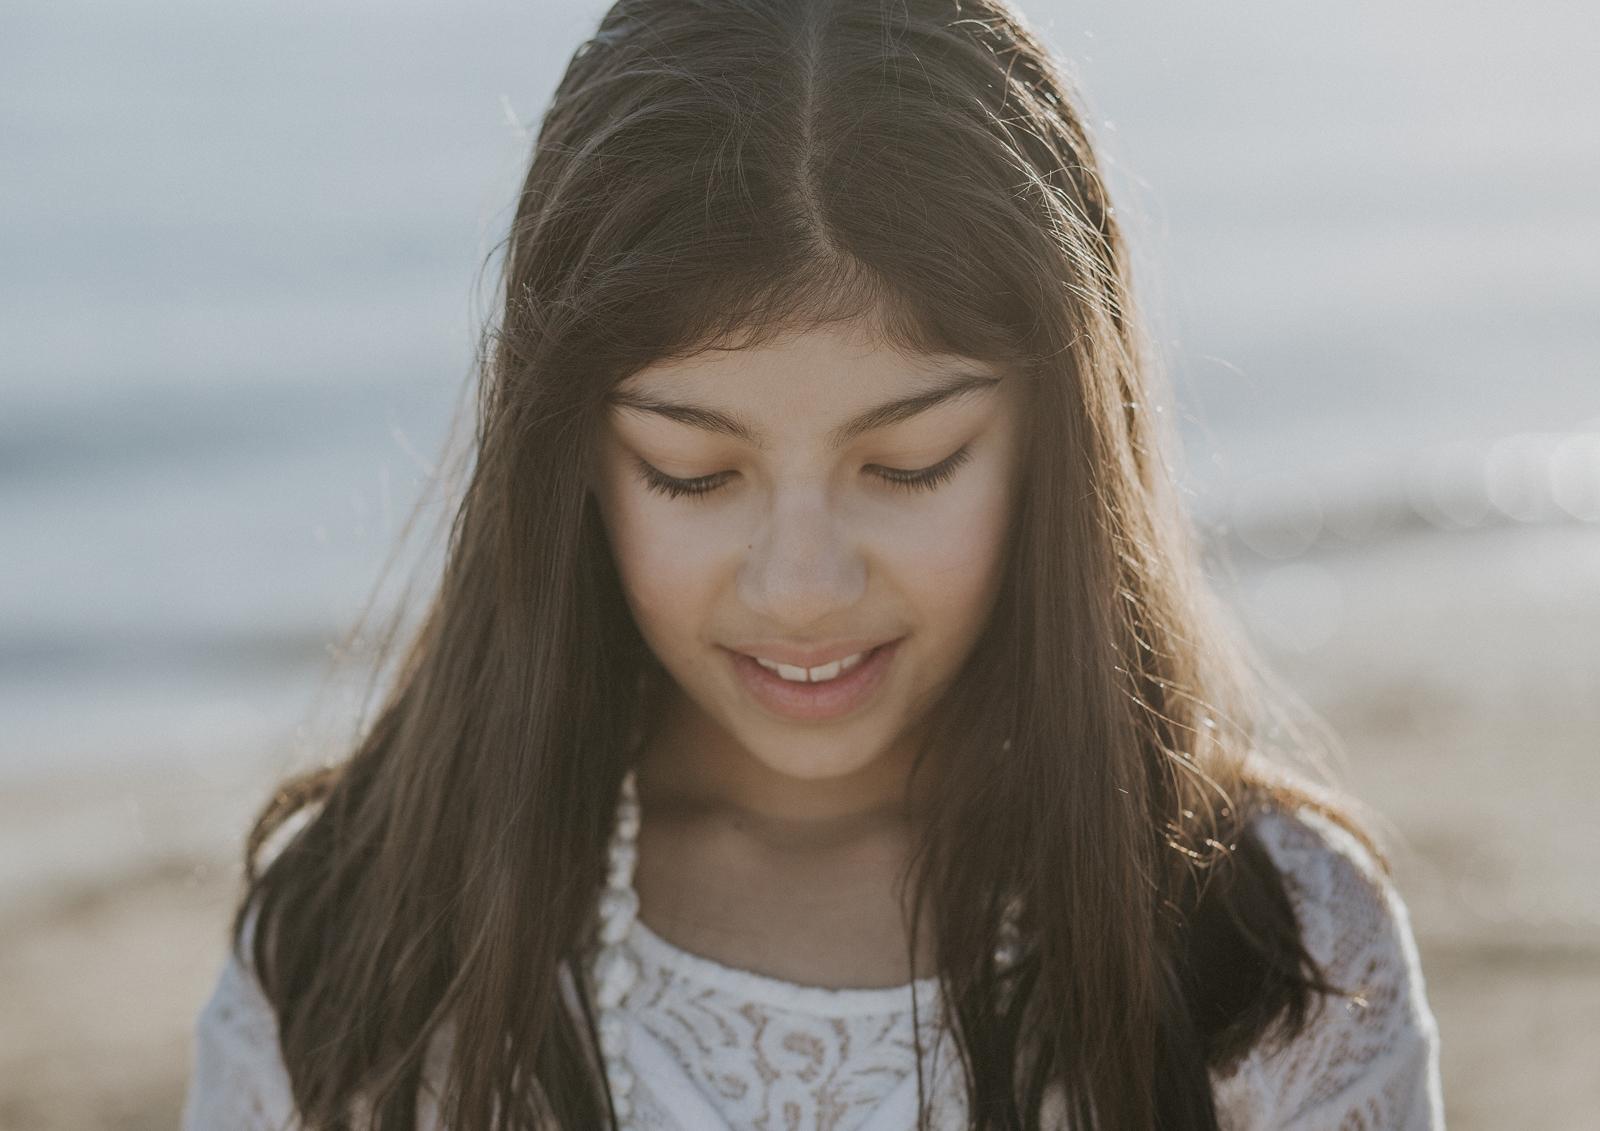 Beautiful photo of Tween girl!